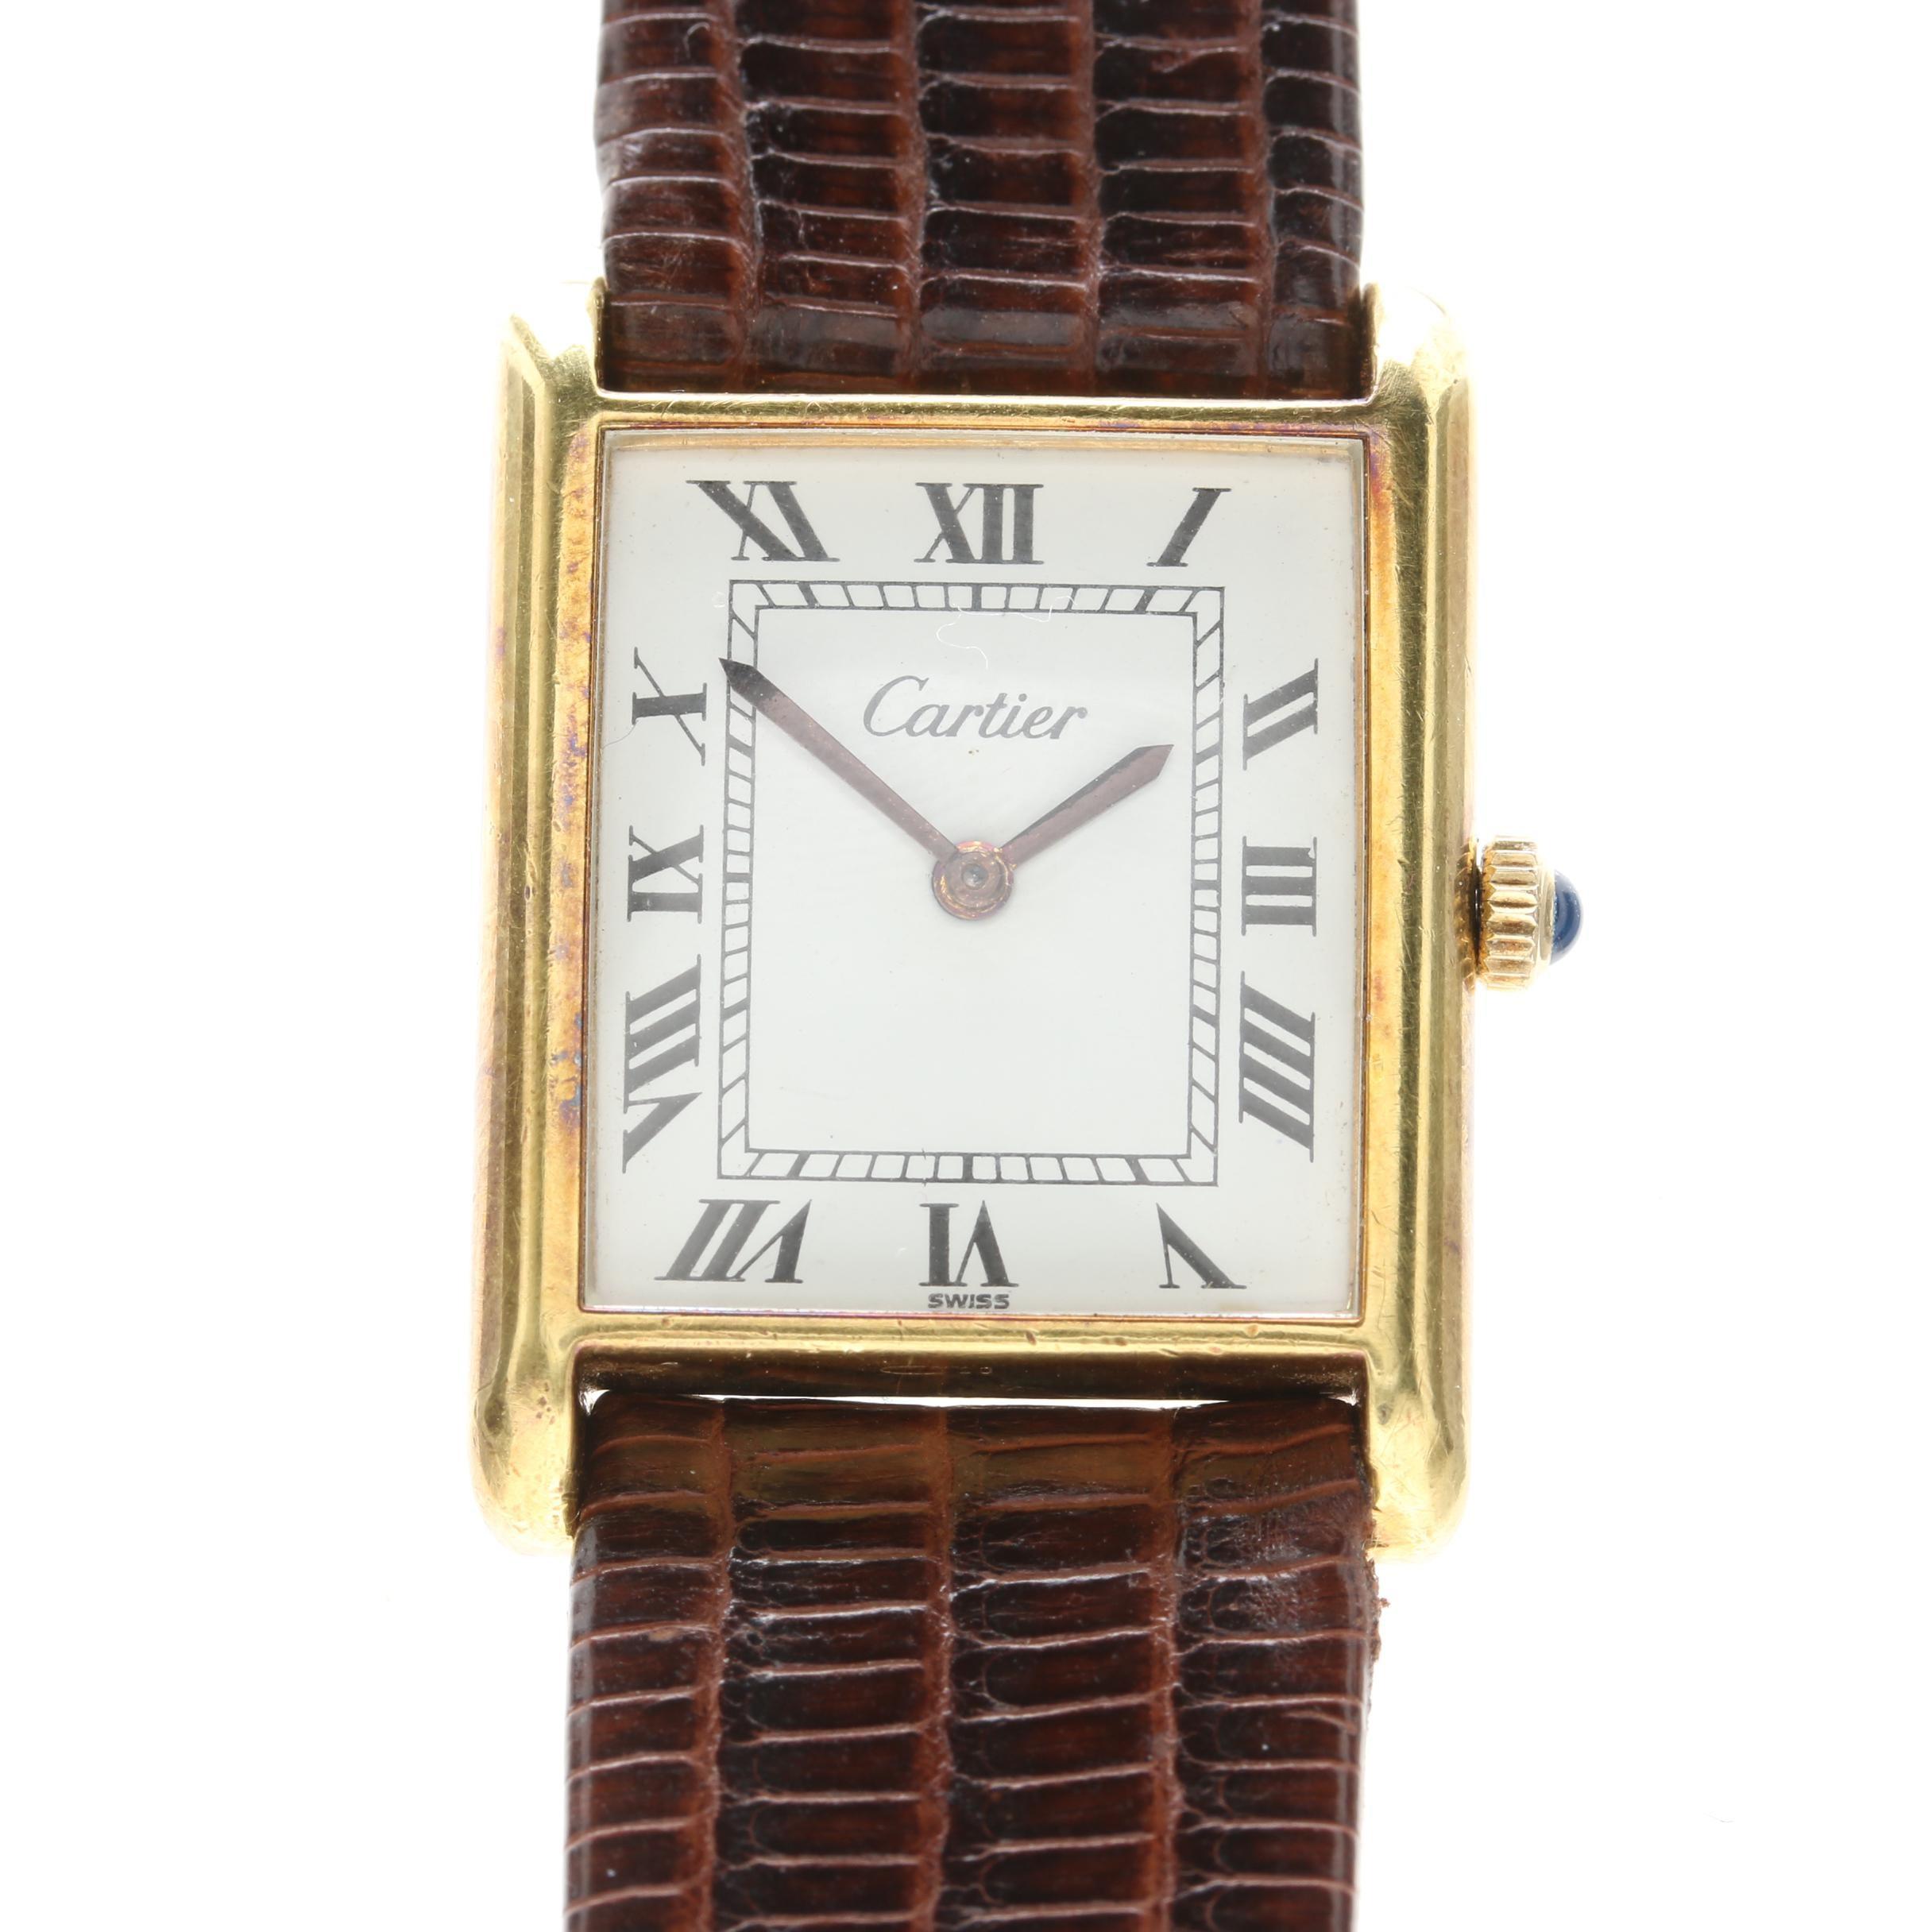 Cartier Gold Plated Stem Wind Wristwatch